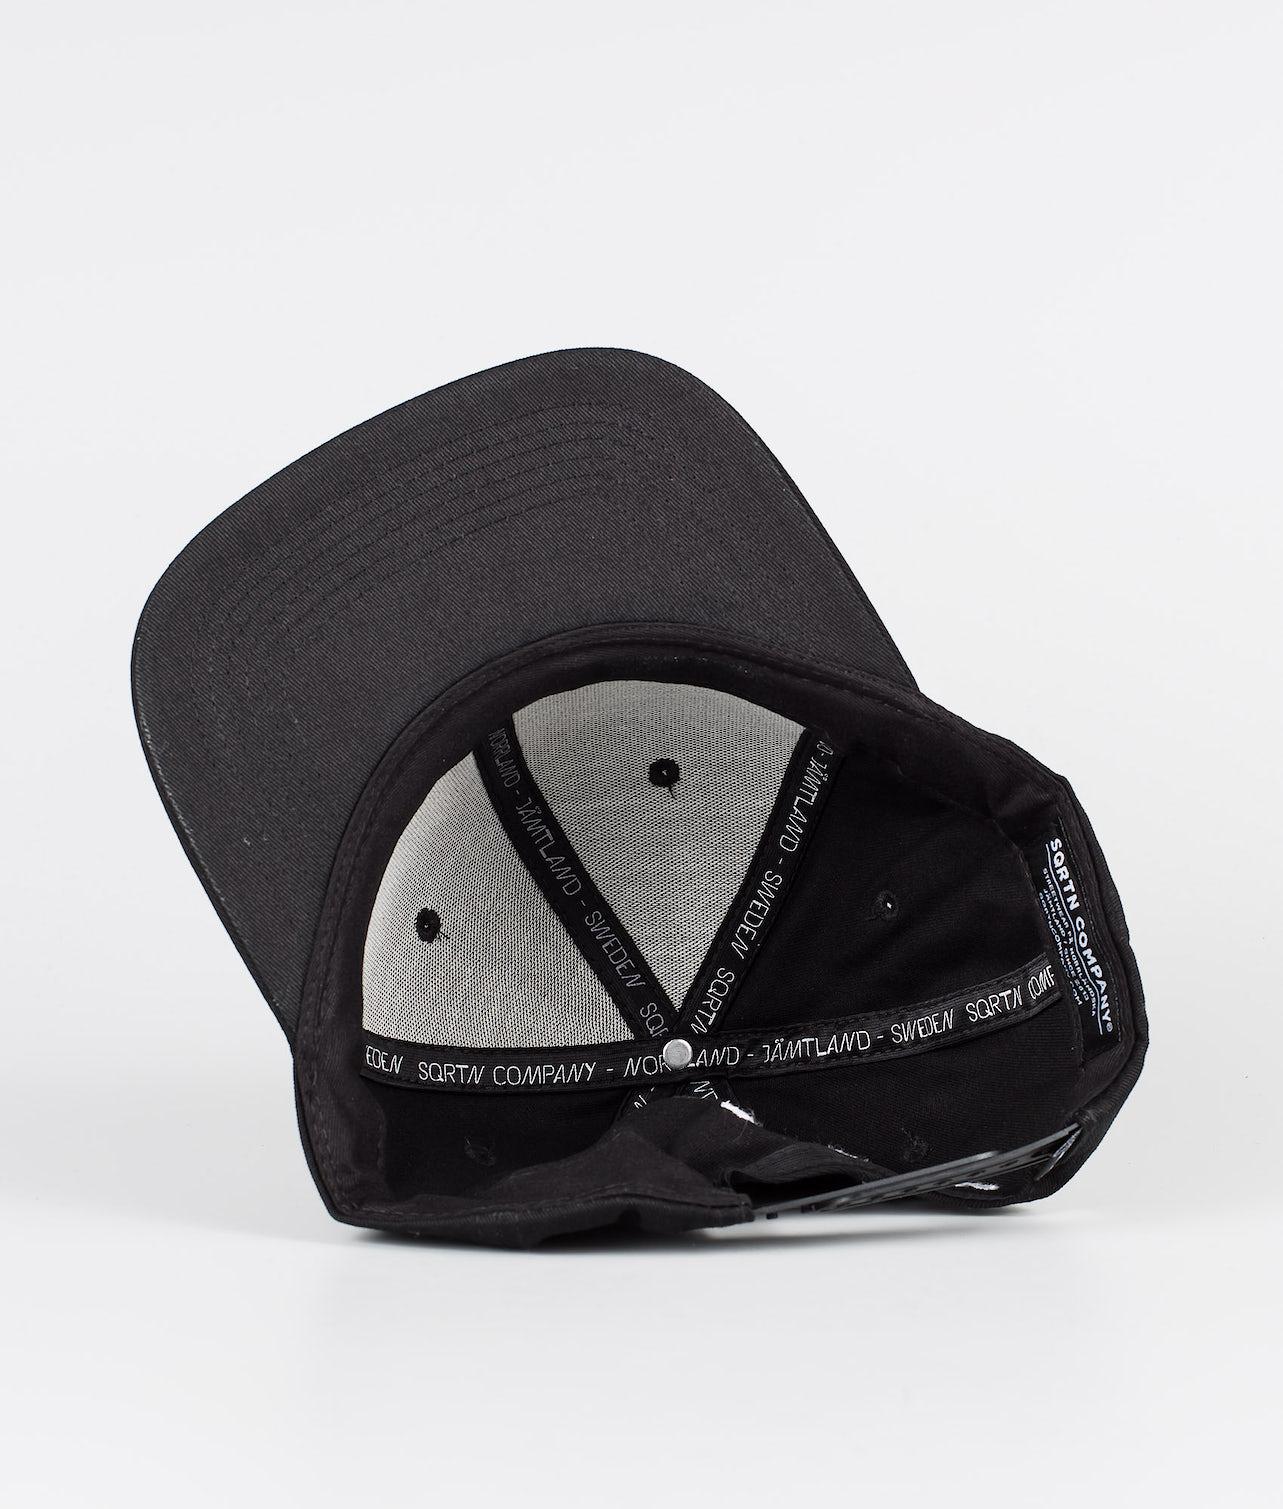 SQRTN Silence 2 Caps Black